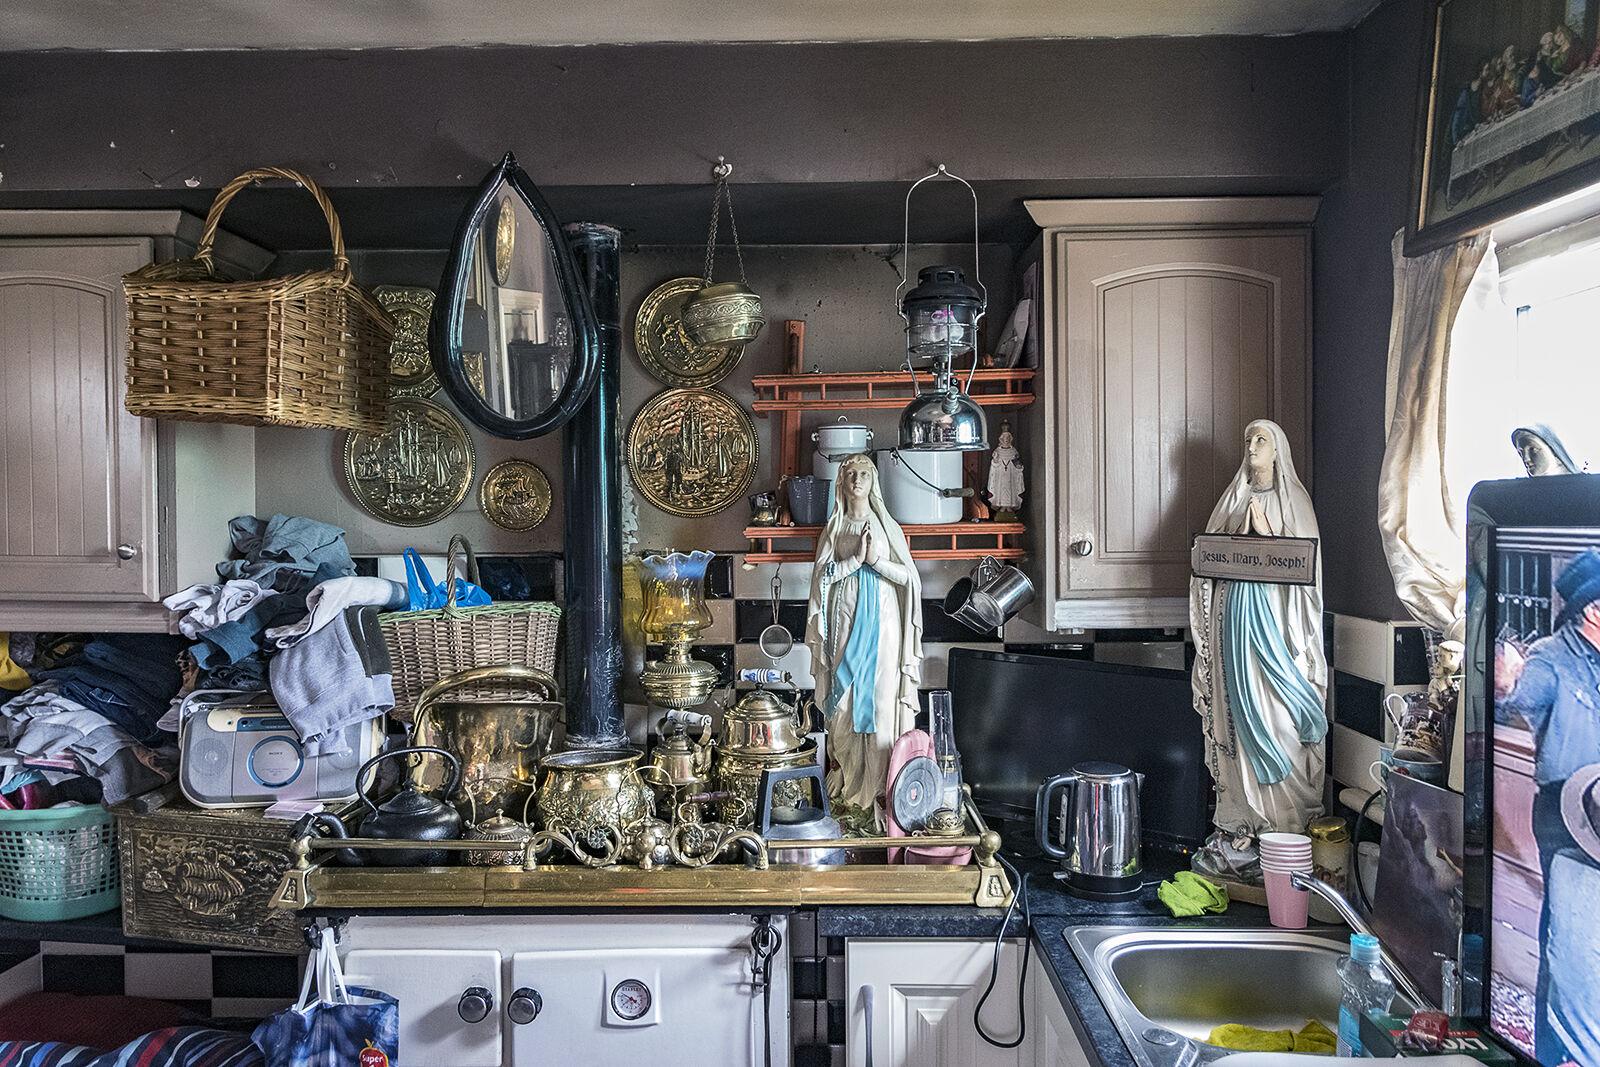 Philomena's Kitchen, Limerick, Ireland 2018